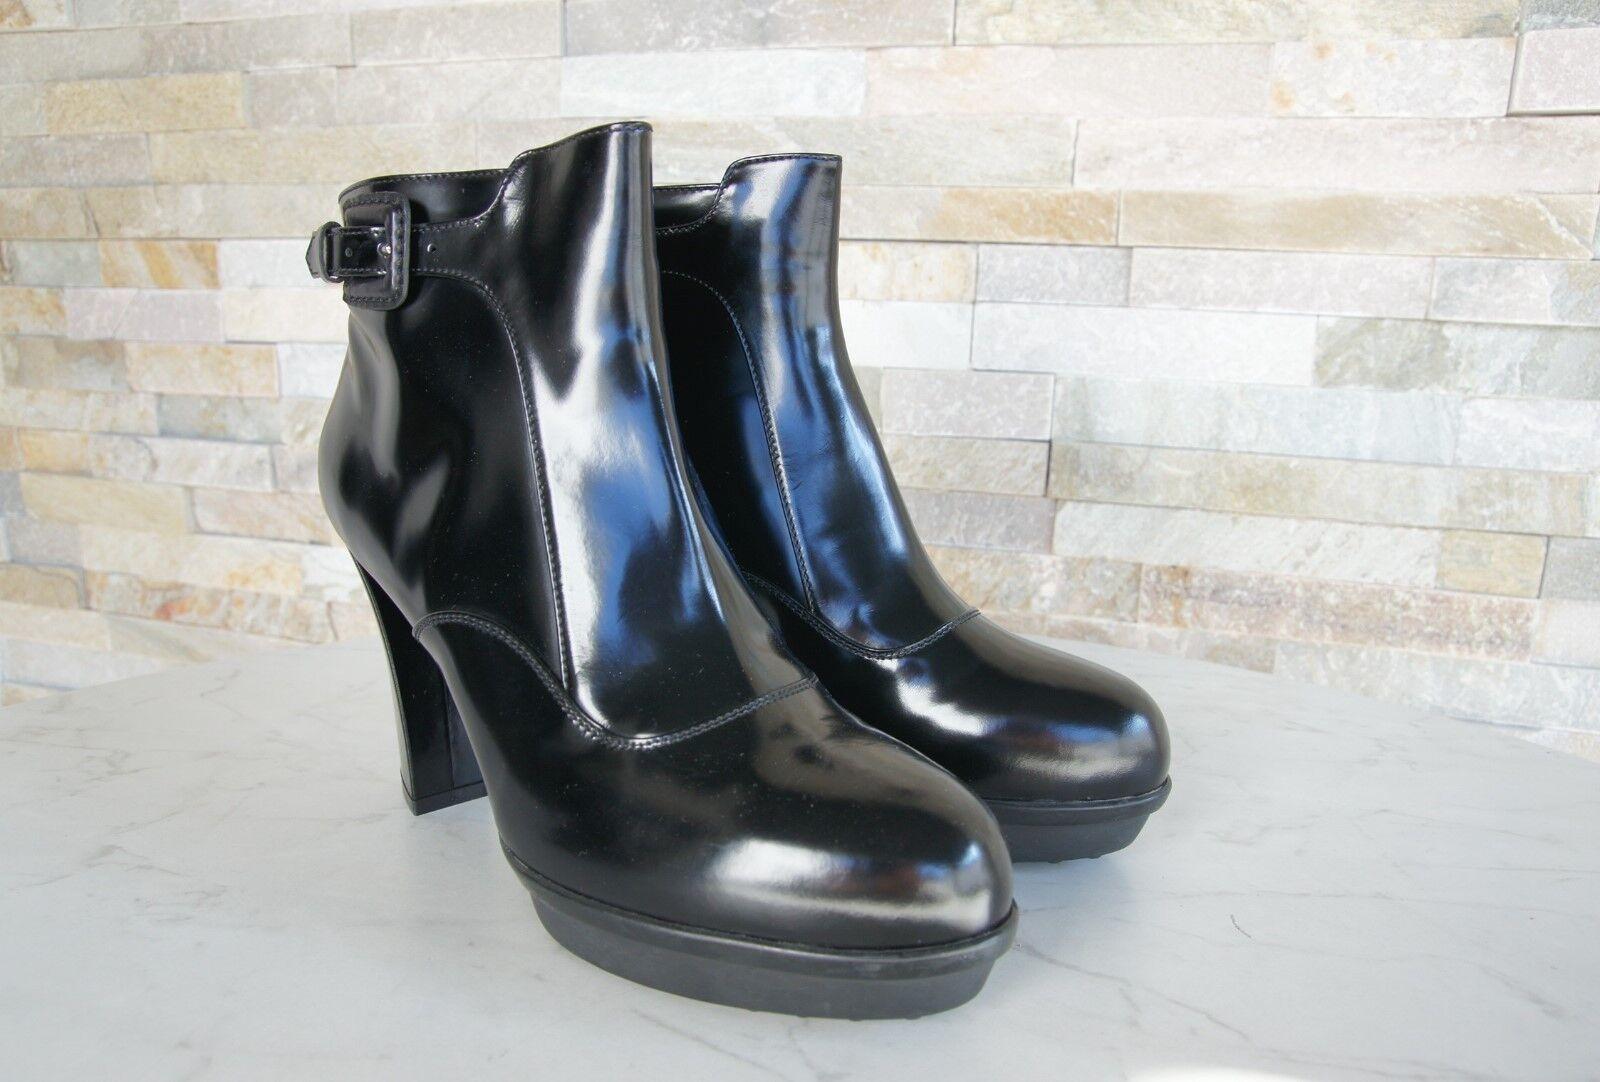 TODS TODS TODS TOD'S Bottines T 41 PLATEFORME démarrageies Chaussures Noir Neuf Ex Prix Recommandé df672a